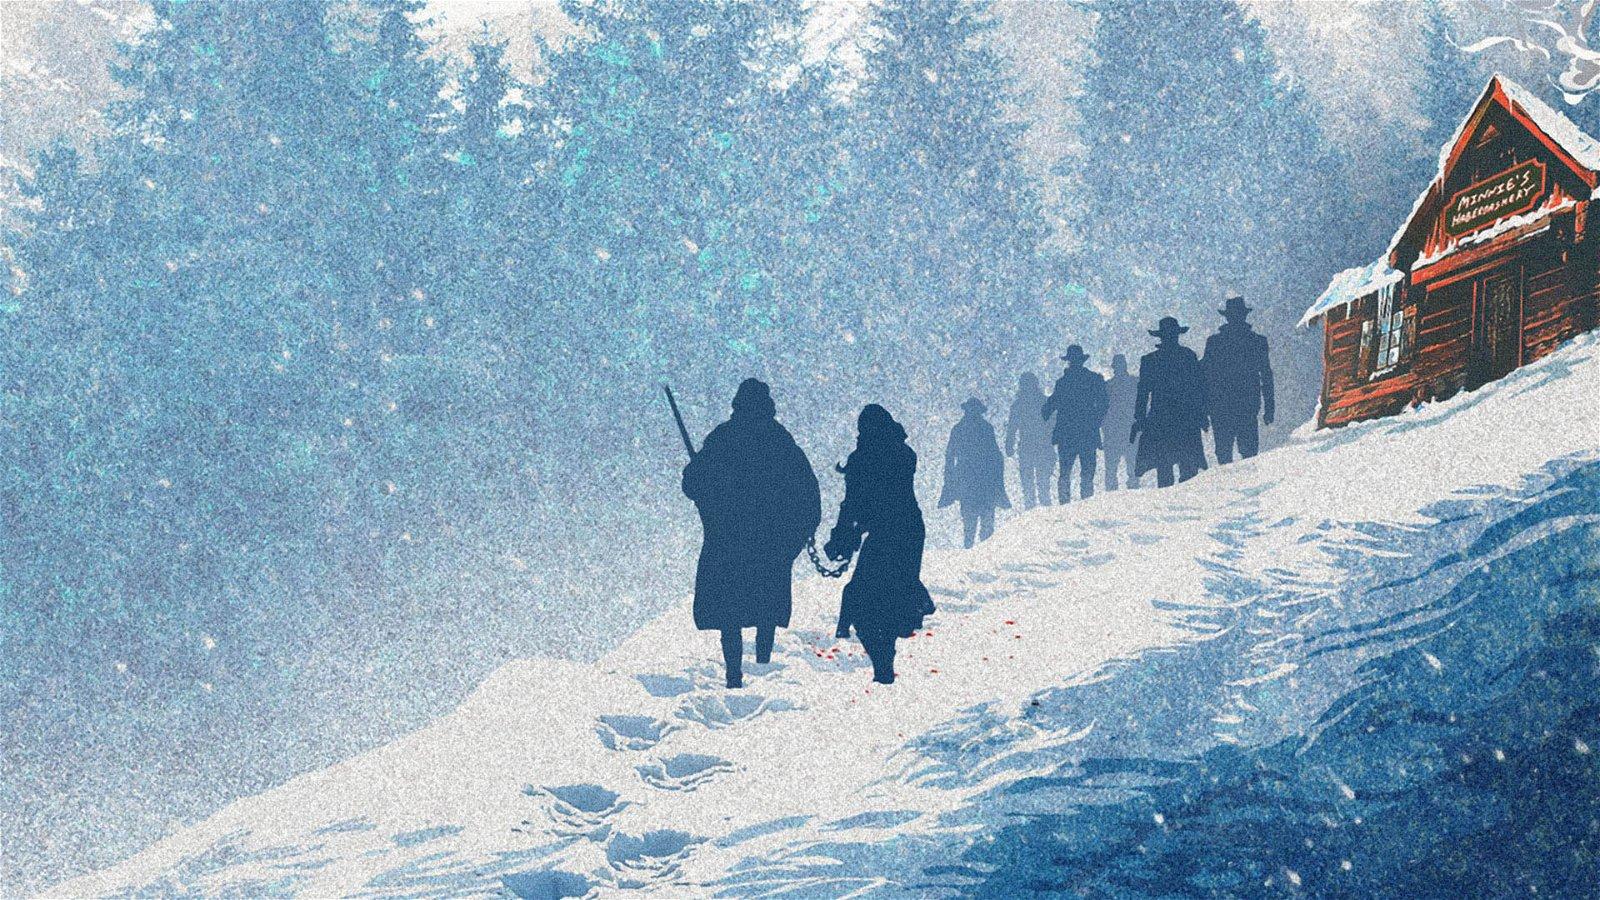 The Top Ten Winter Misery Genre Movies 1